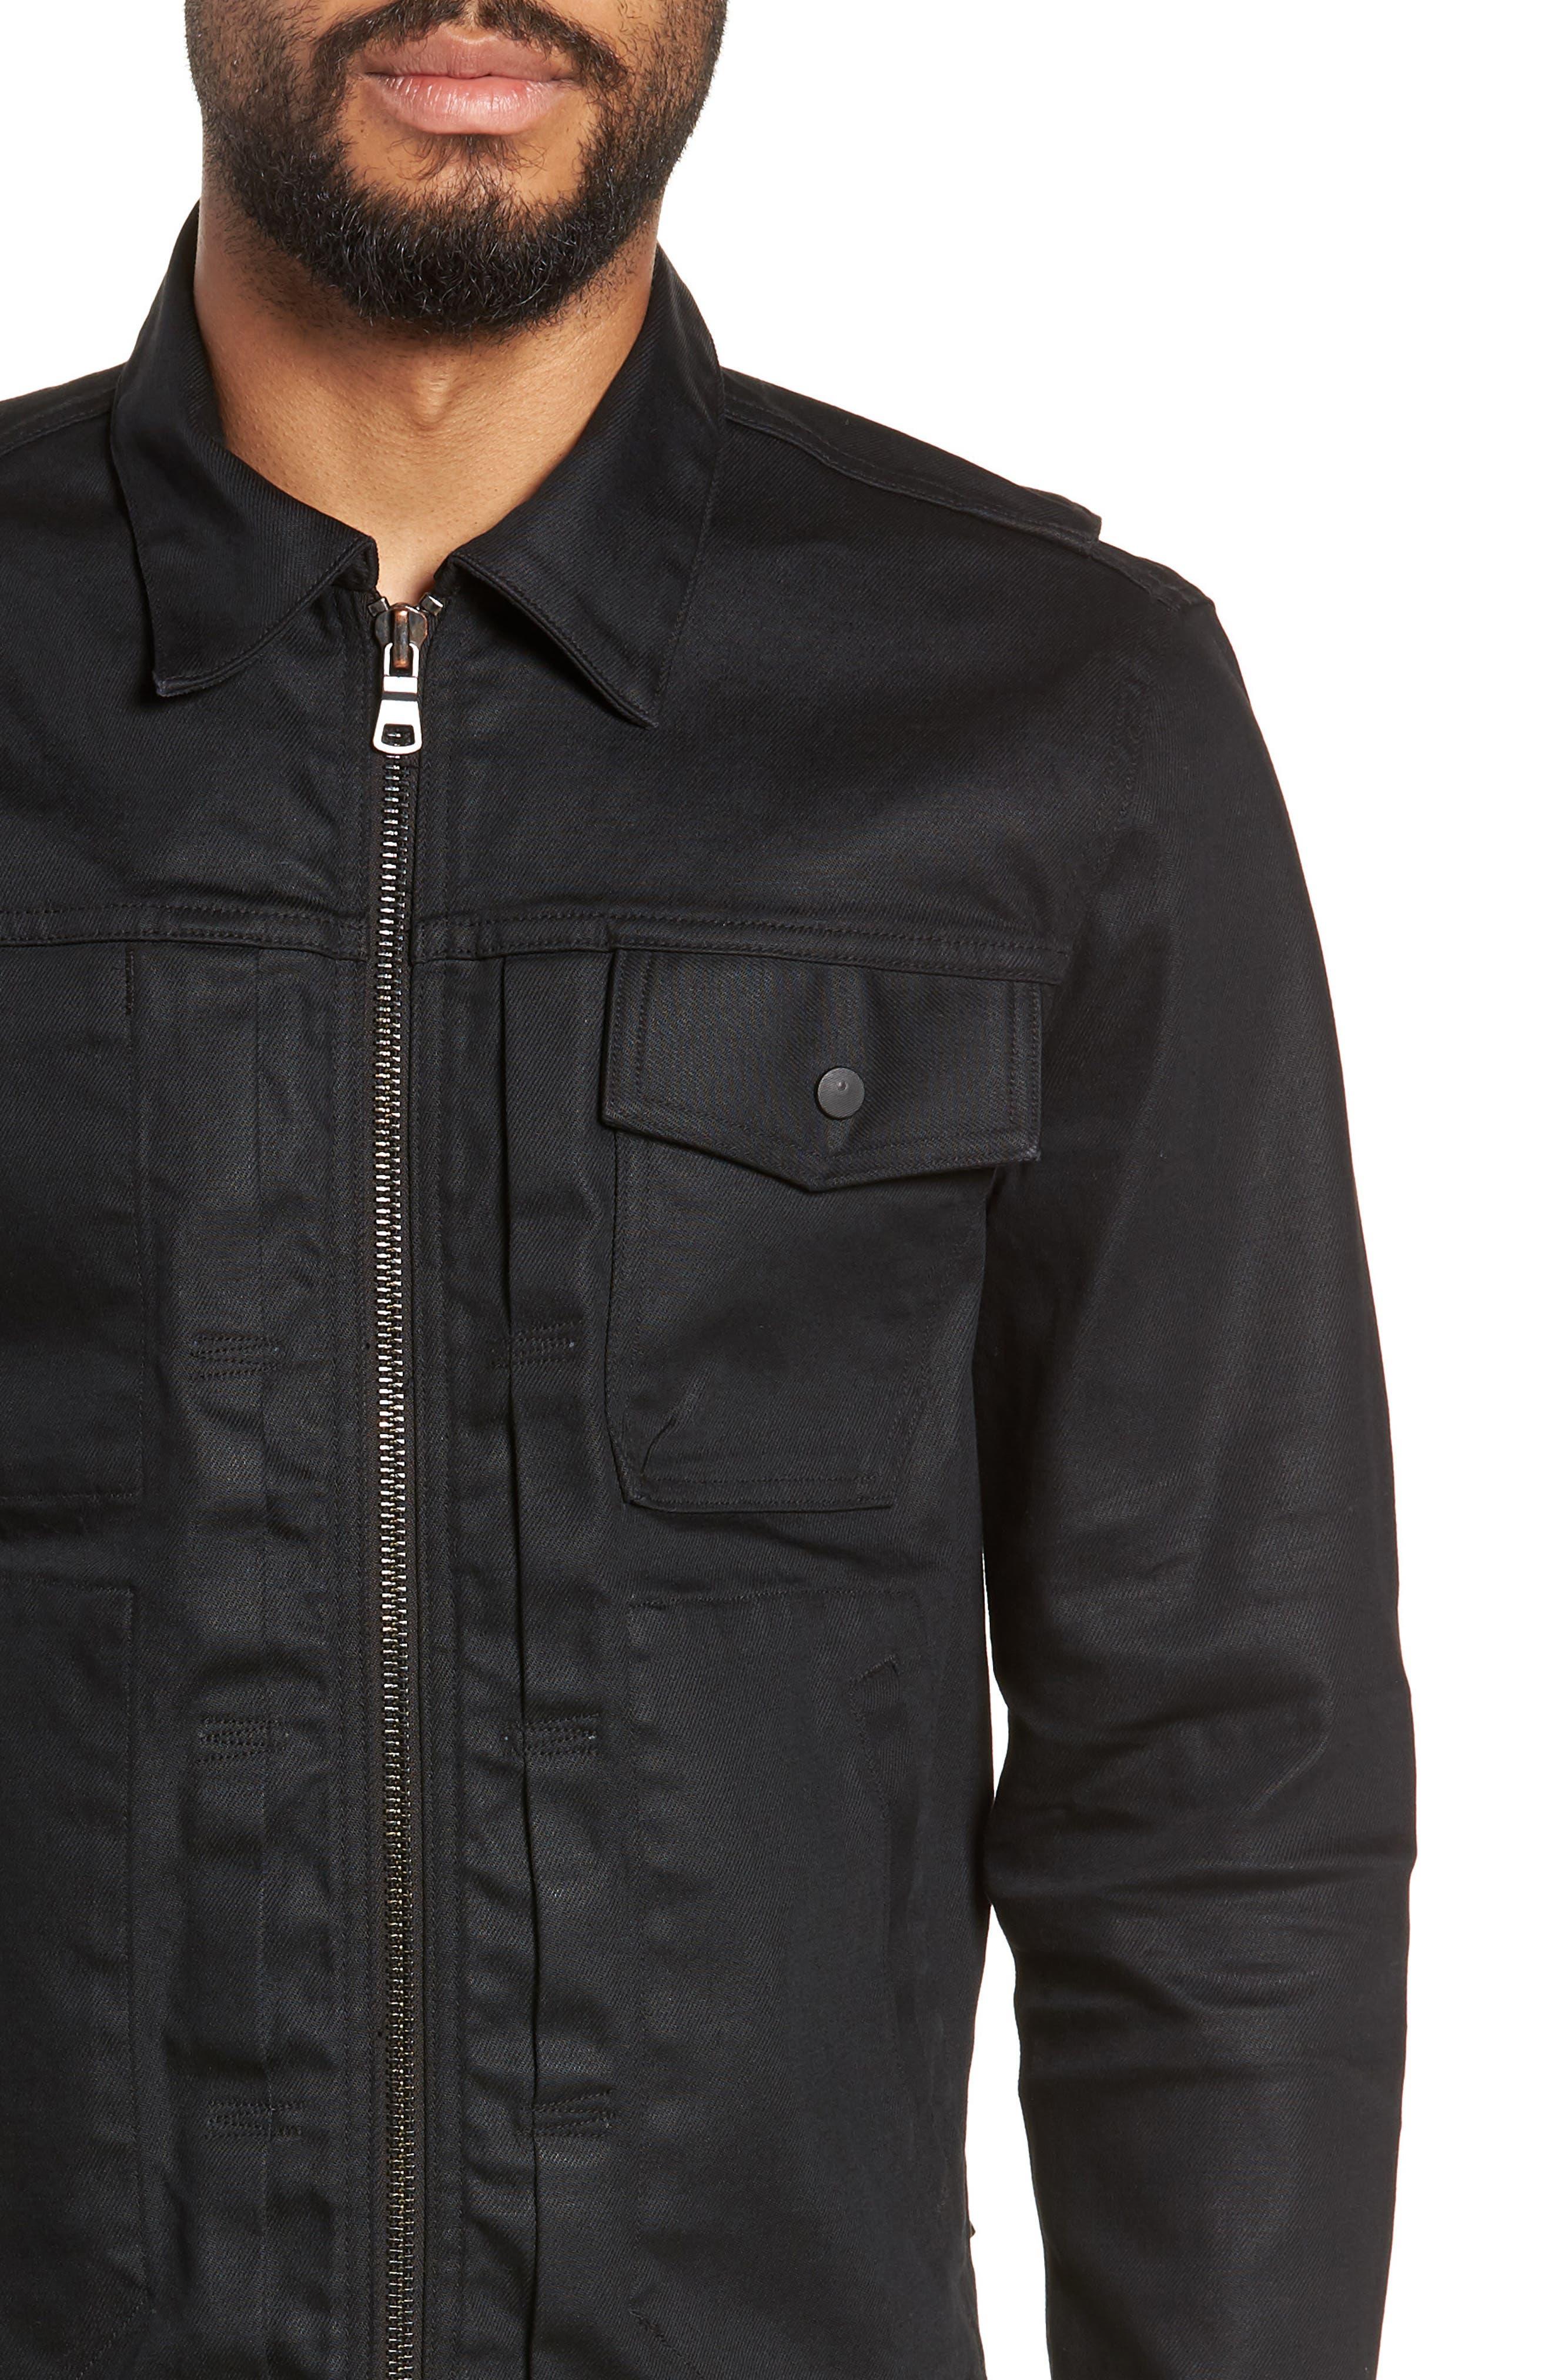 HUDSON JEANS, Zip Denim Jacket, Alternate thumbnail 4, color, ONYX